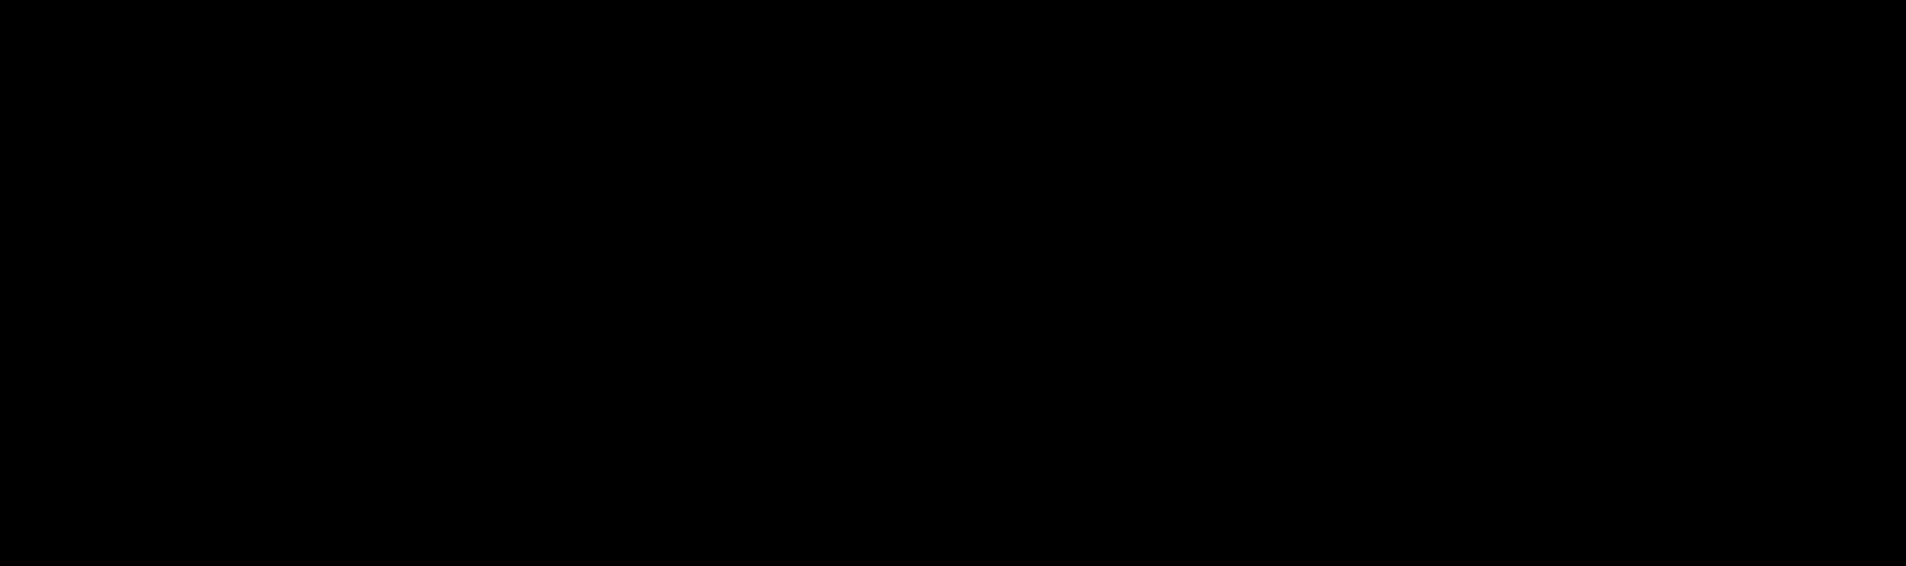 AG 556